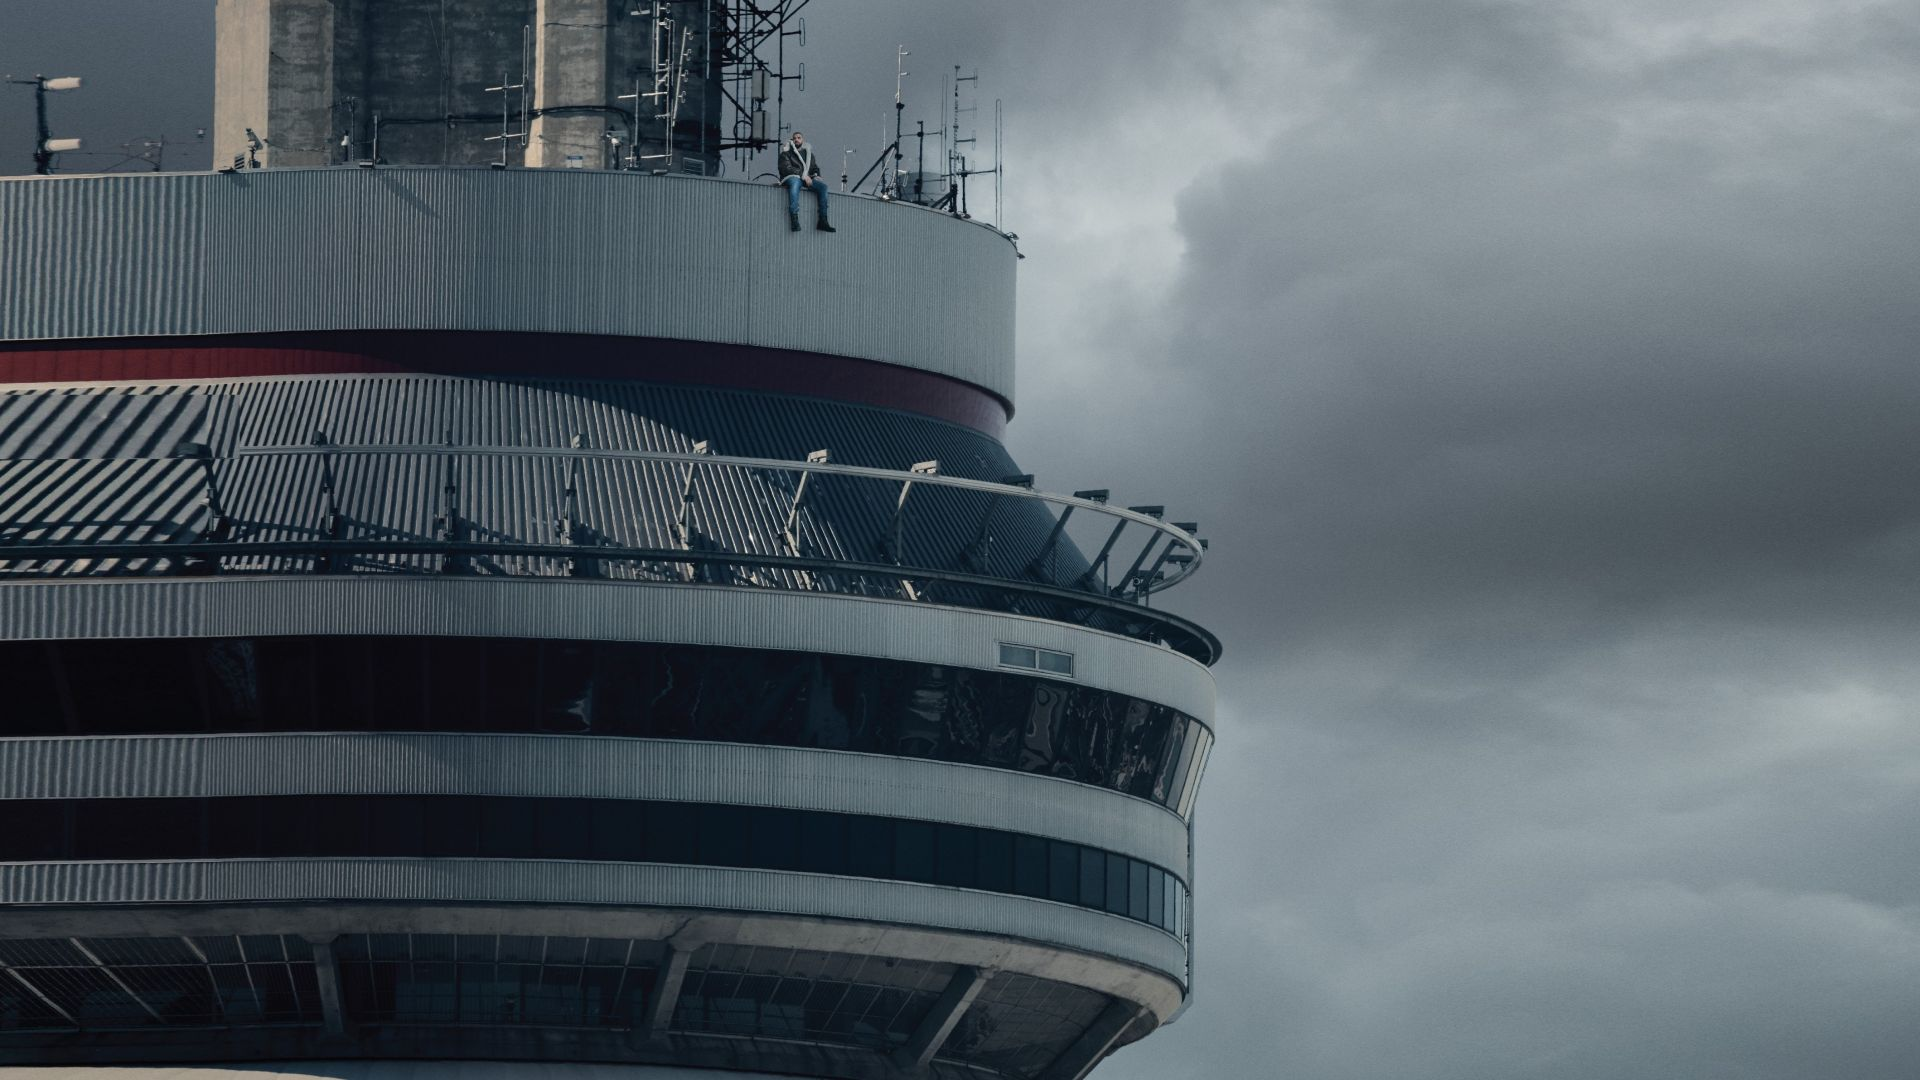 wallpaper drake views top music artist and bands hip